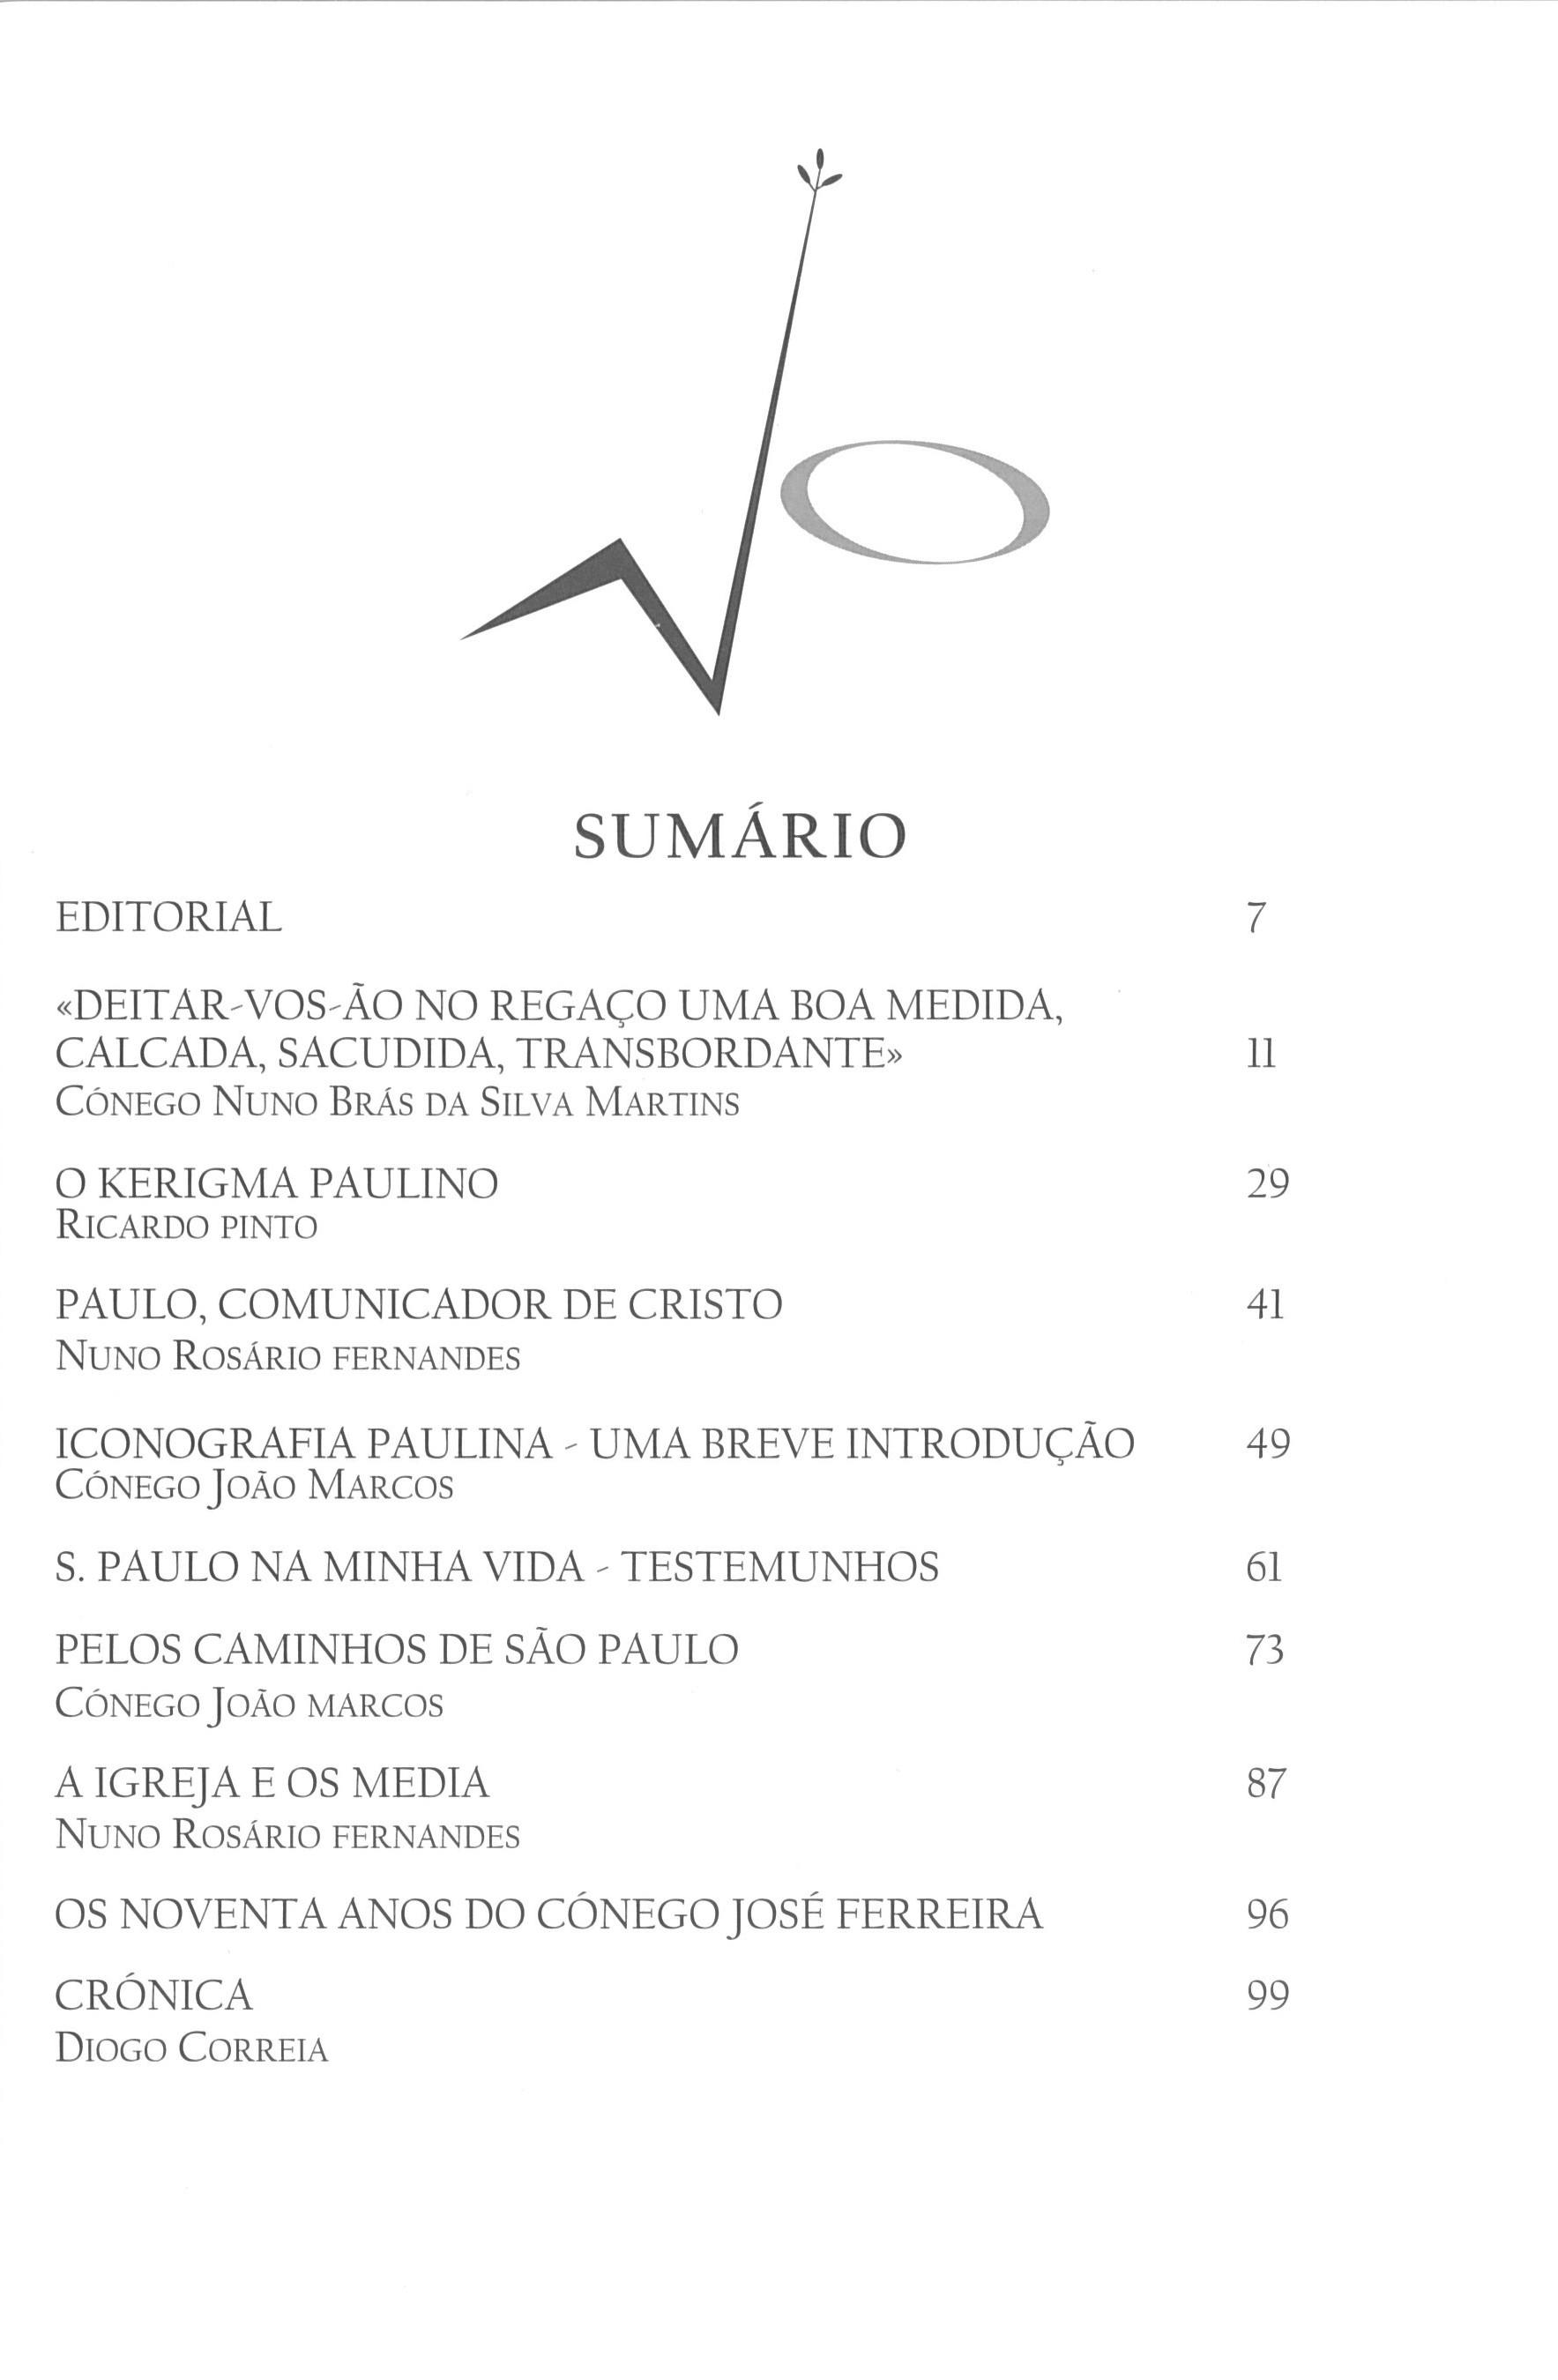 Revista Novellae Olivarum, nº 37 - Novembro de 2008 (índice)